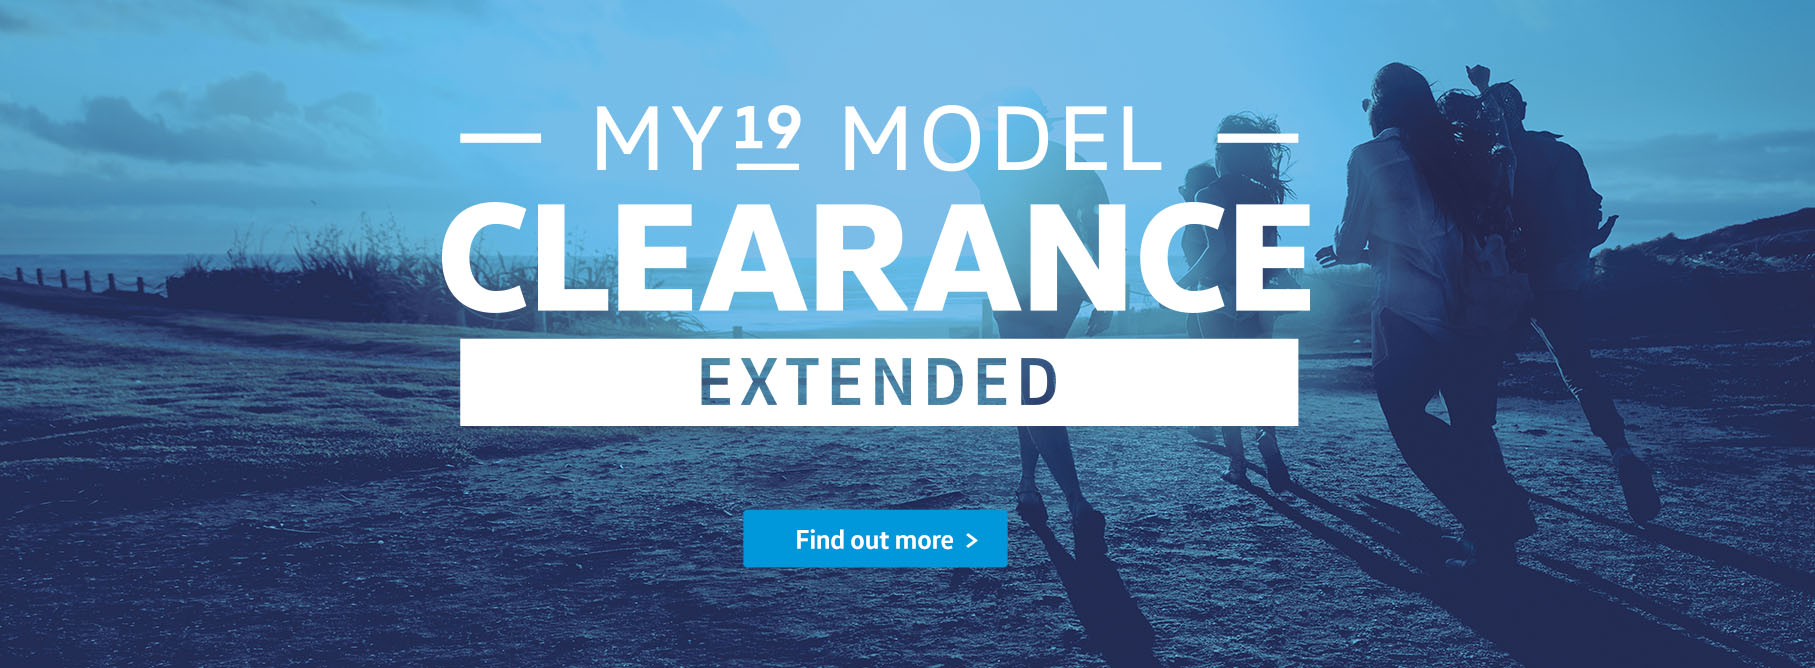 MY19 Model Clearance Passenger